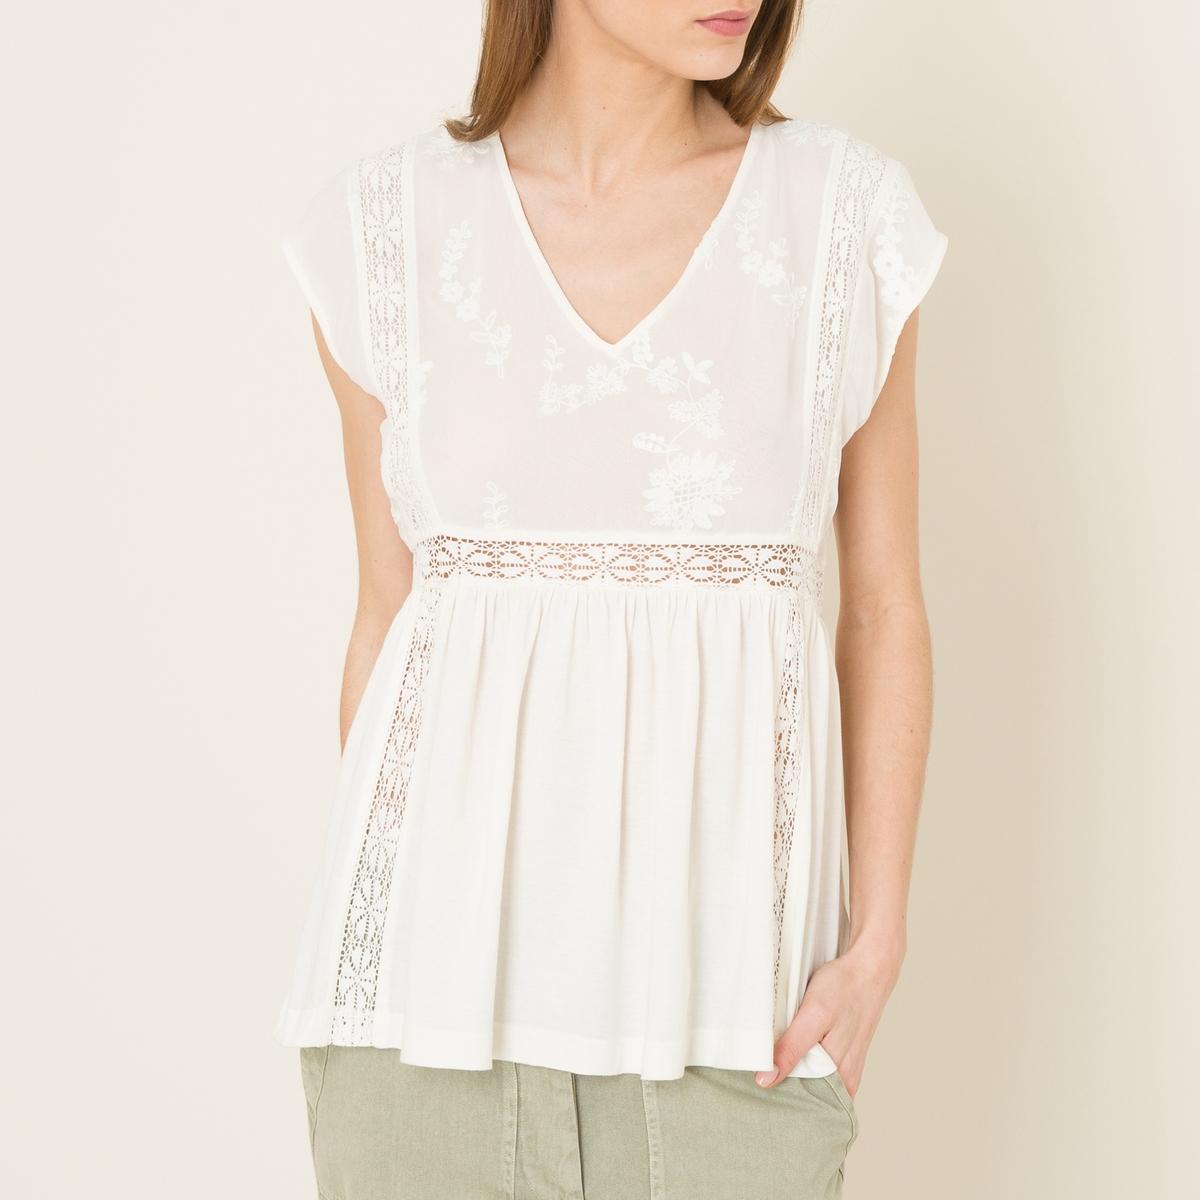 Блузка без рукавов stella толстовка зайка с бабочкой вышивка